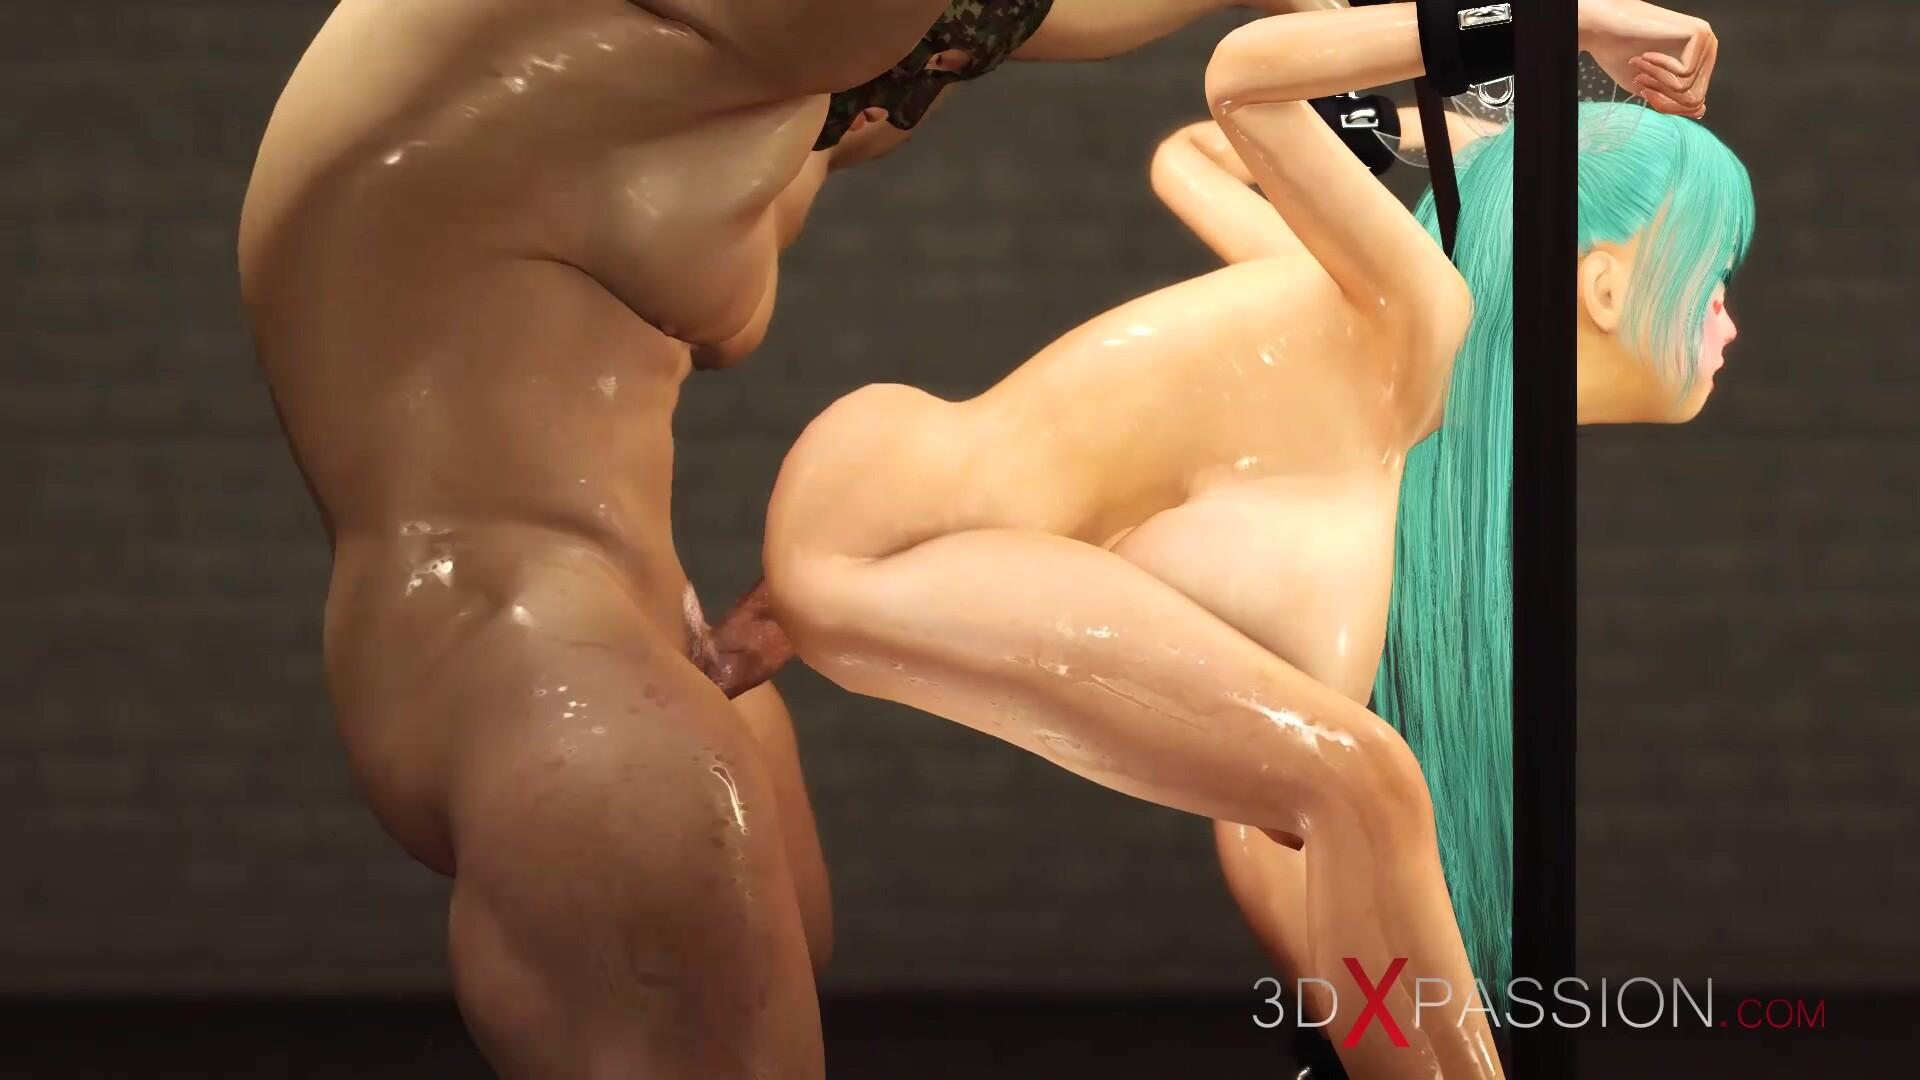 Hot sex! Huge boobed cuffed girl gets a hard anal fuck hardcore